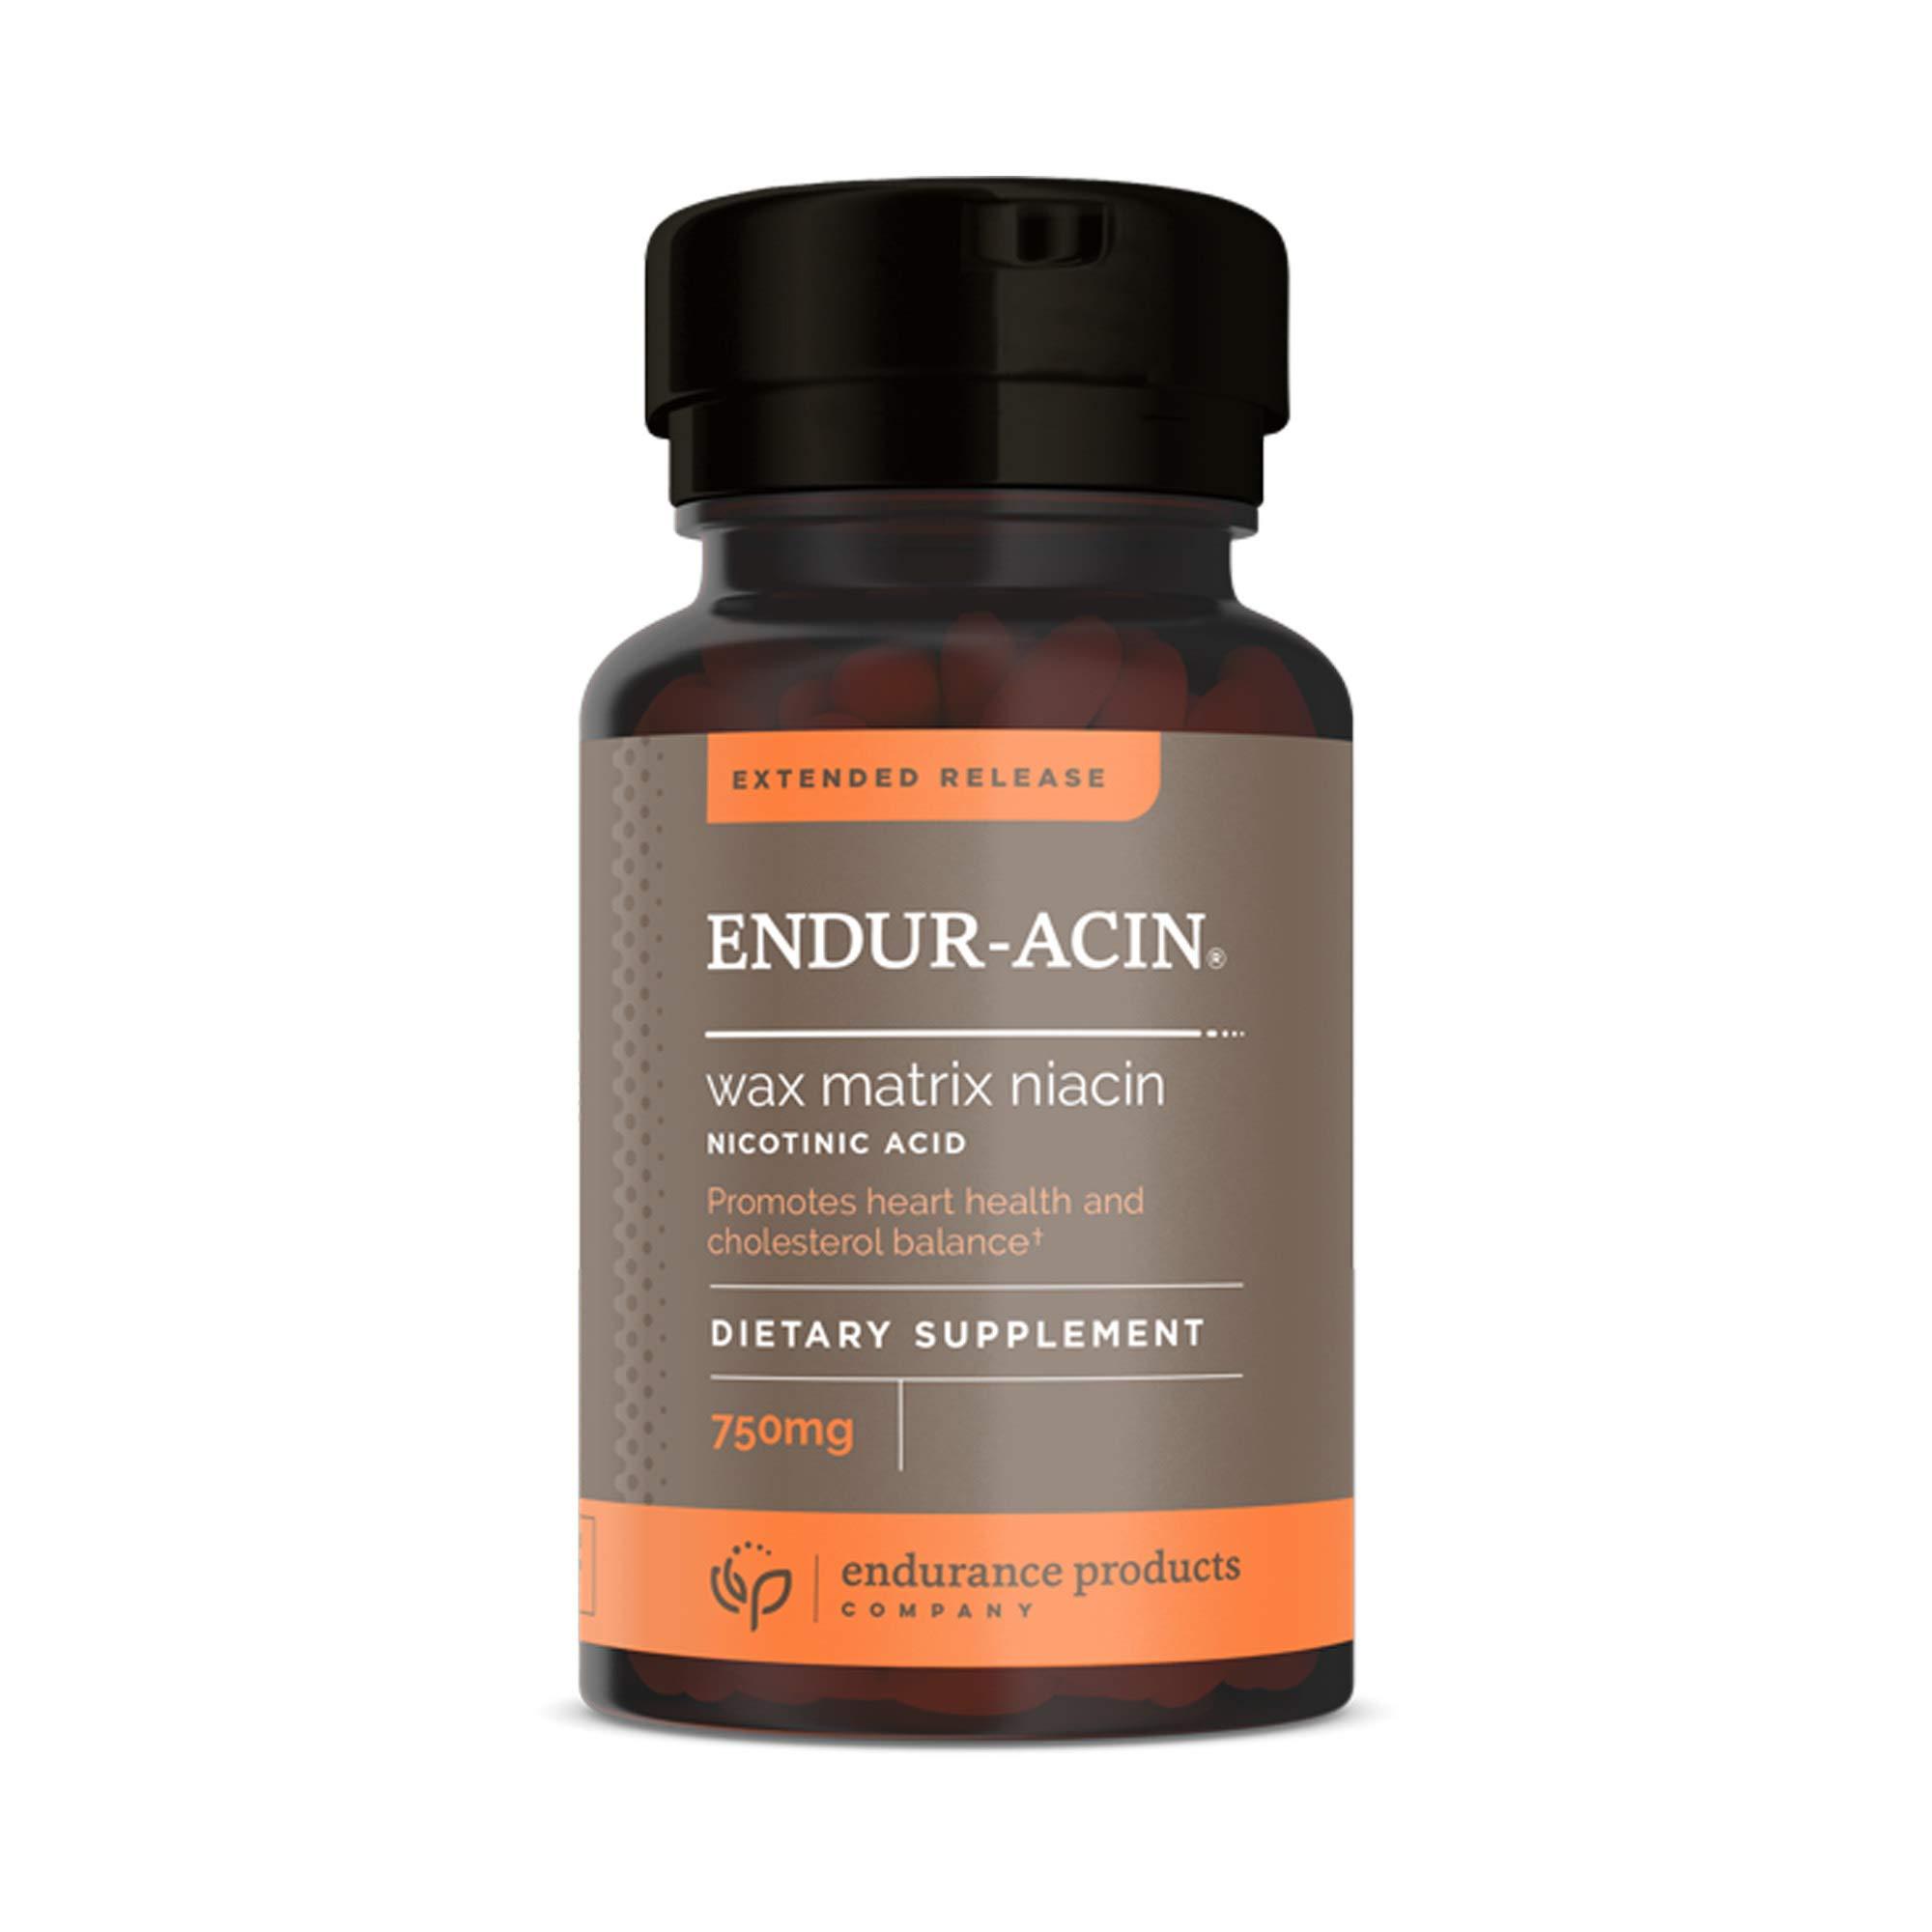 Extended Release ENDUR-ACIN® Wax Matrix Niacin (Nicotinic Acid) 750mg 60 Tablets - Pack of 2